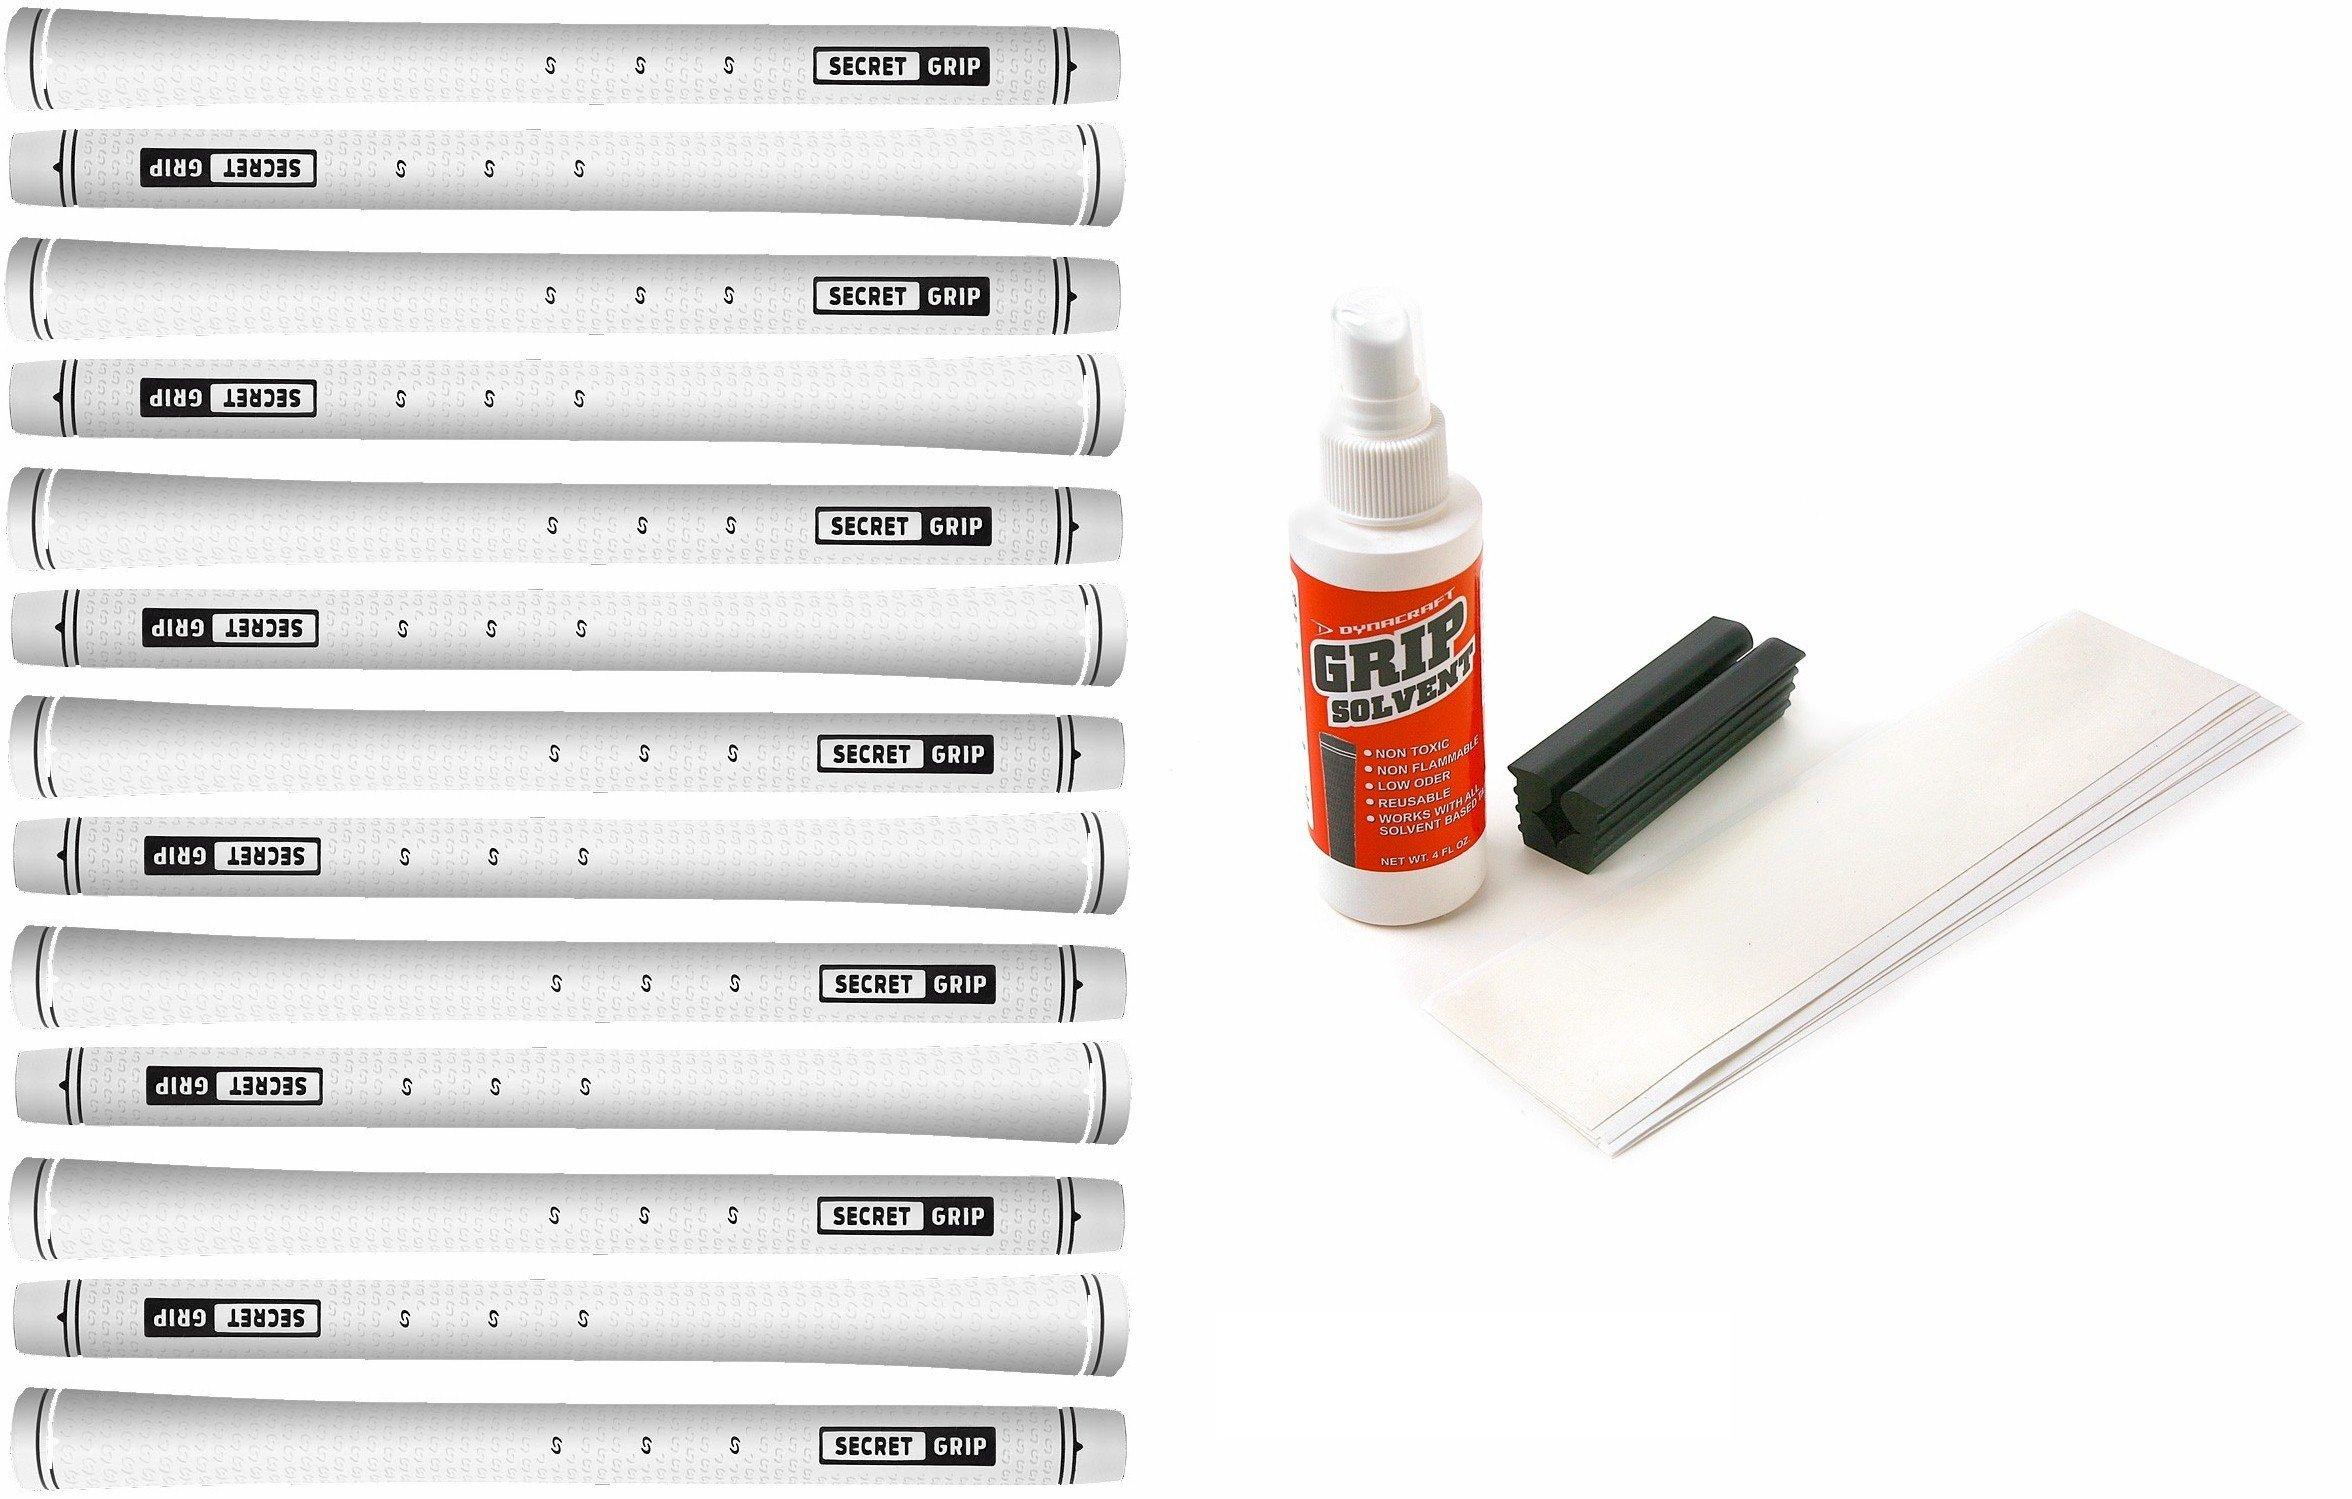 Boccieri Golf Secret Grip Kit with Tape, Solvent and Vise Clamp (13-Piece), White